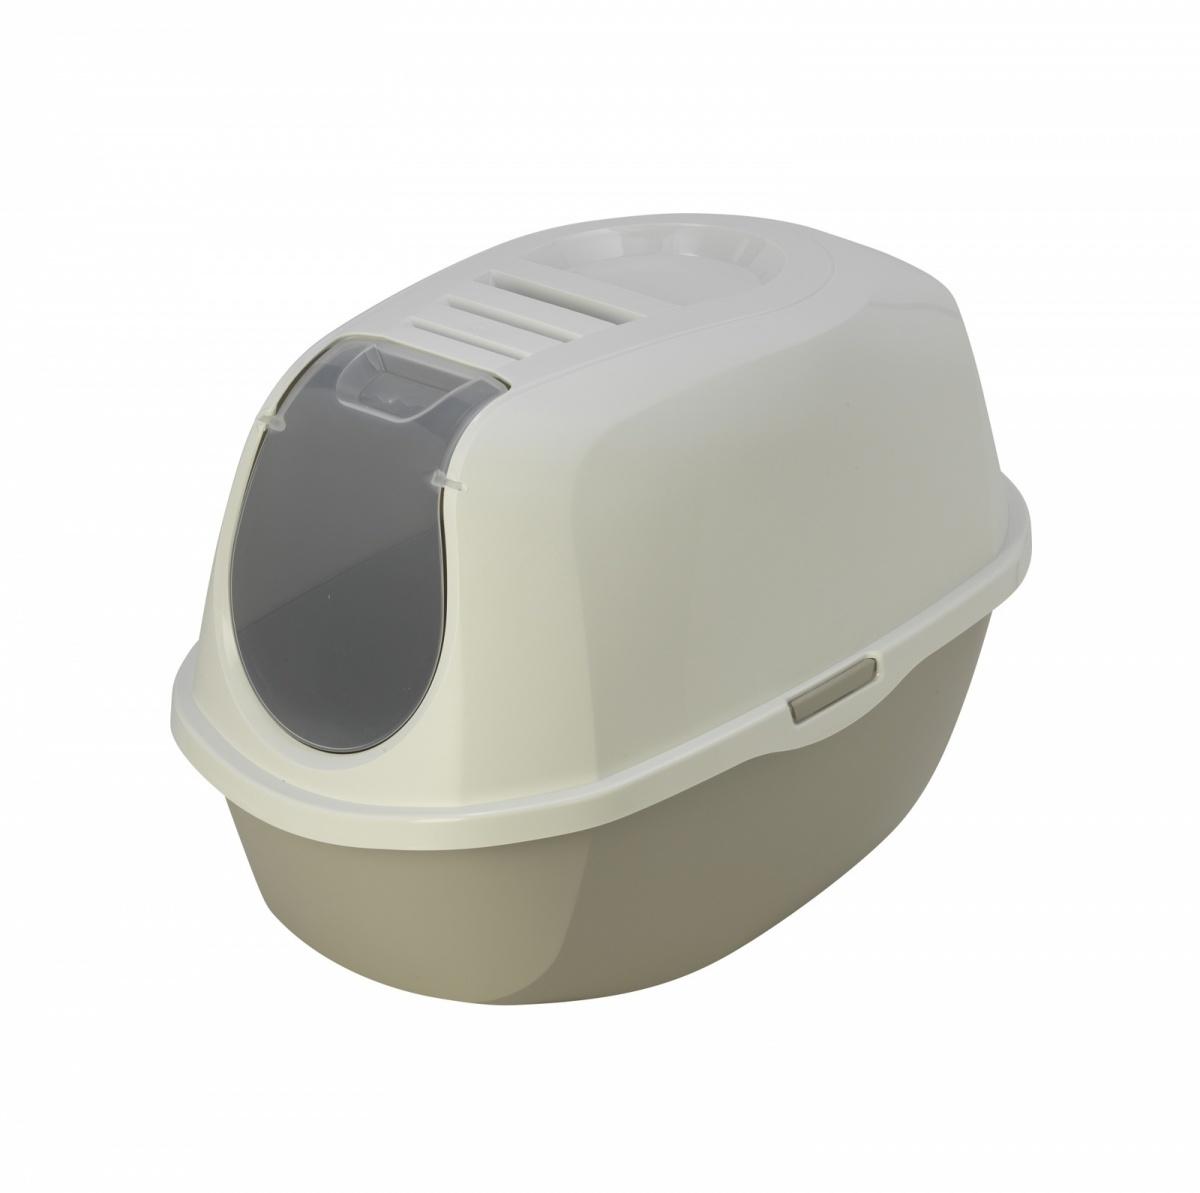 24647/C 370-33 MODERNA Smart Cat  Туалет-домик для кошек 54х40х41 см теплый серый